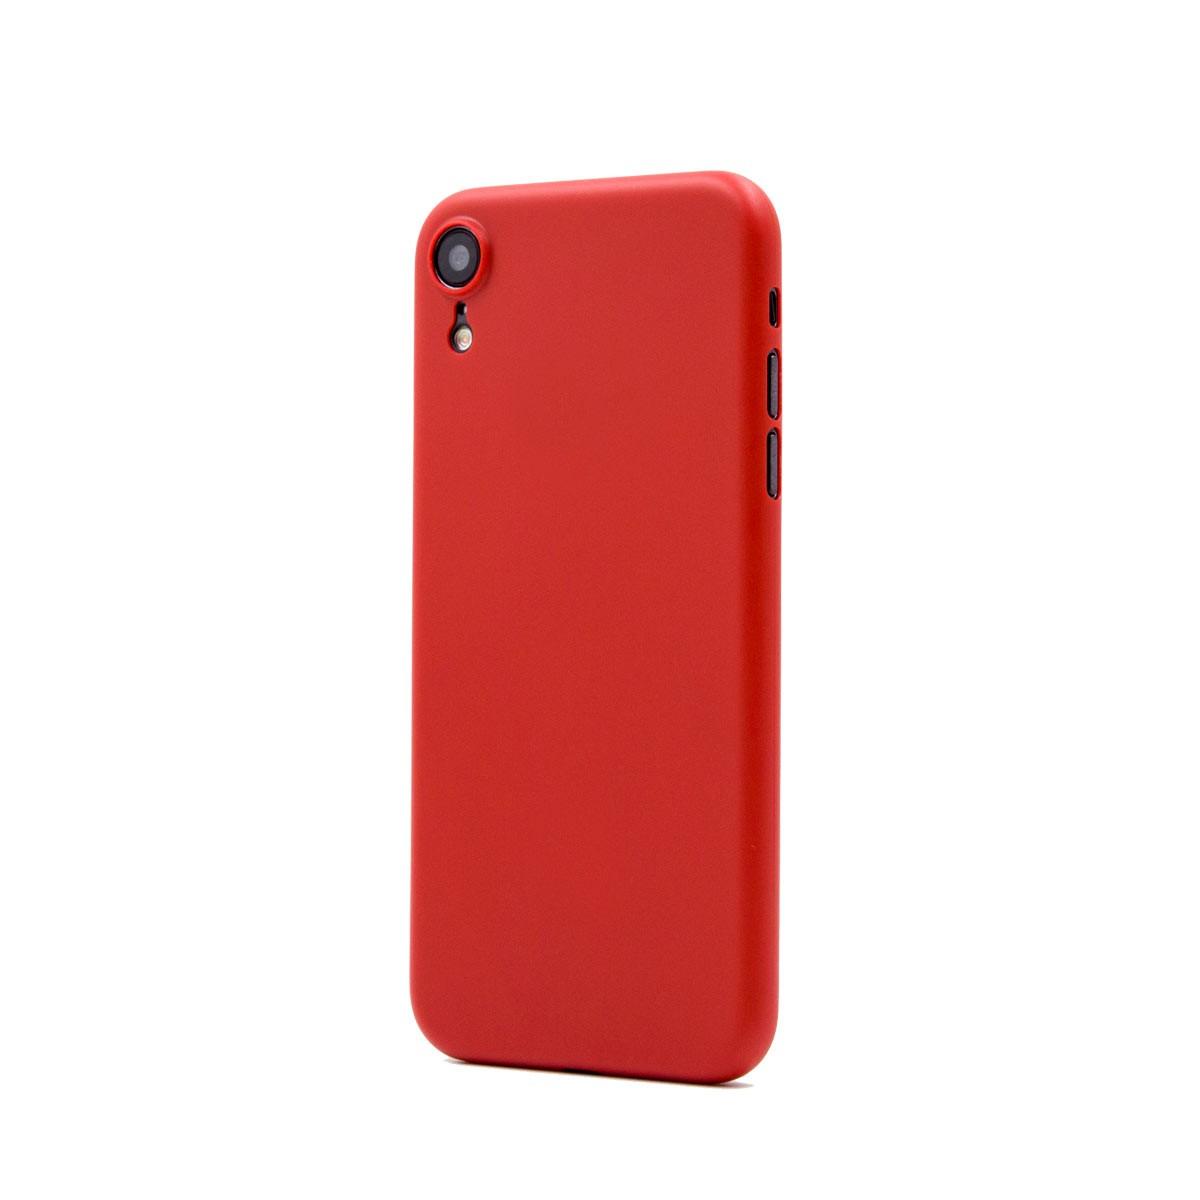 Capac protectie spate cellara colectia thin pentru iphone xr - rosu